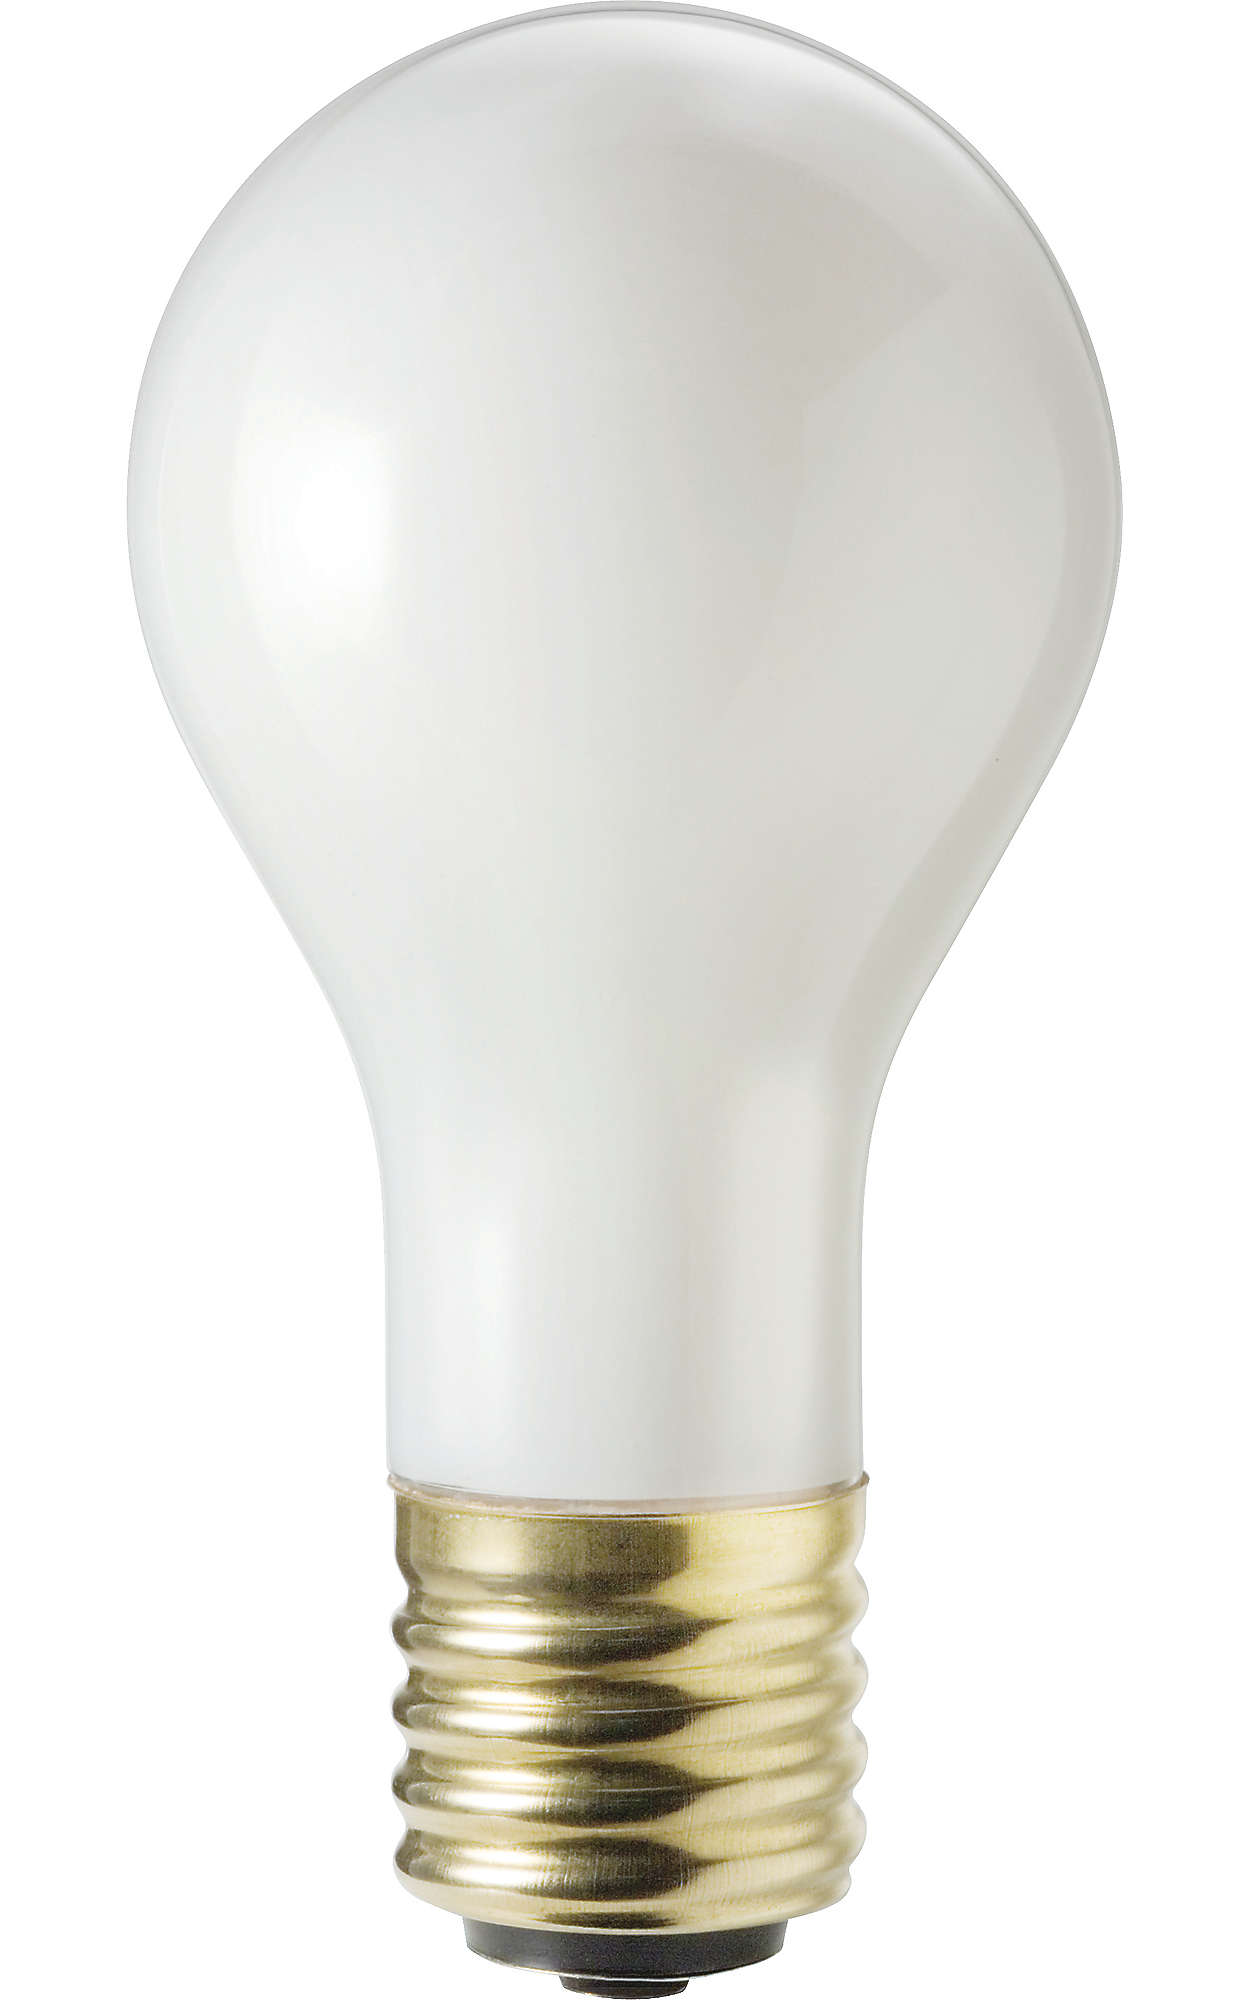 Standard Soft White 3-Way Incandescent